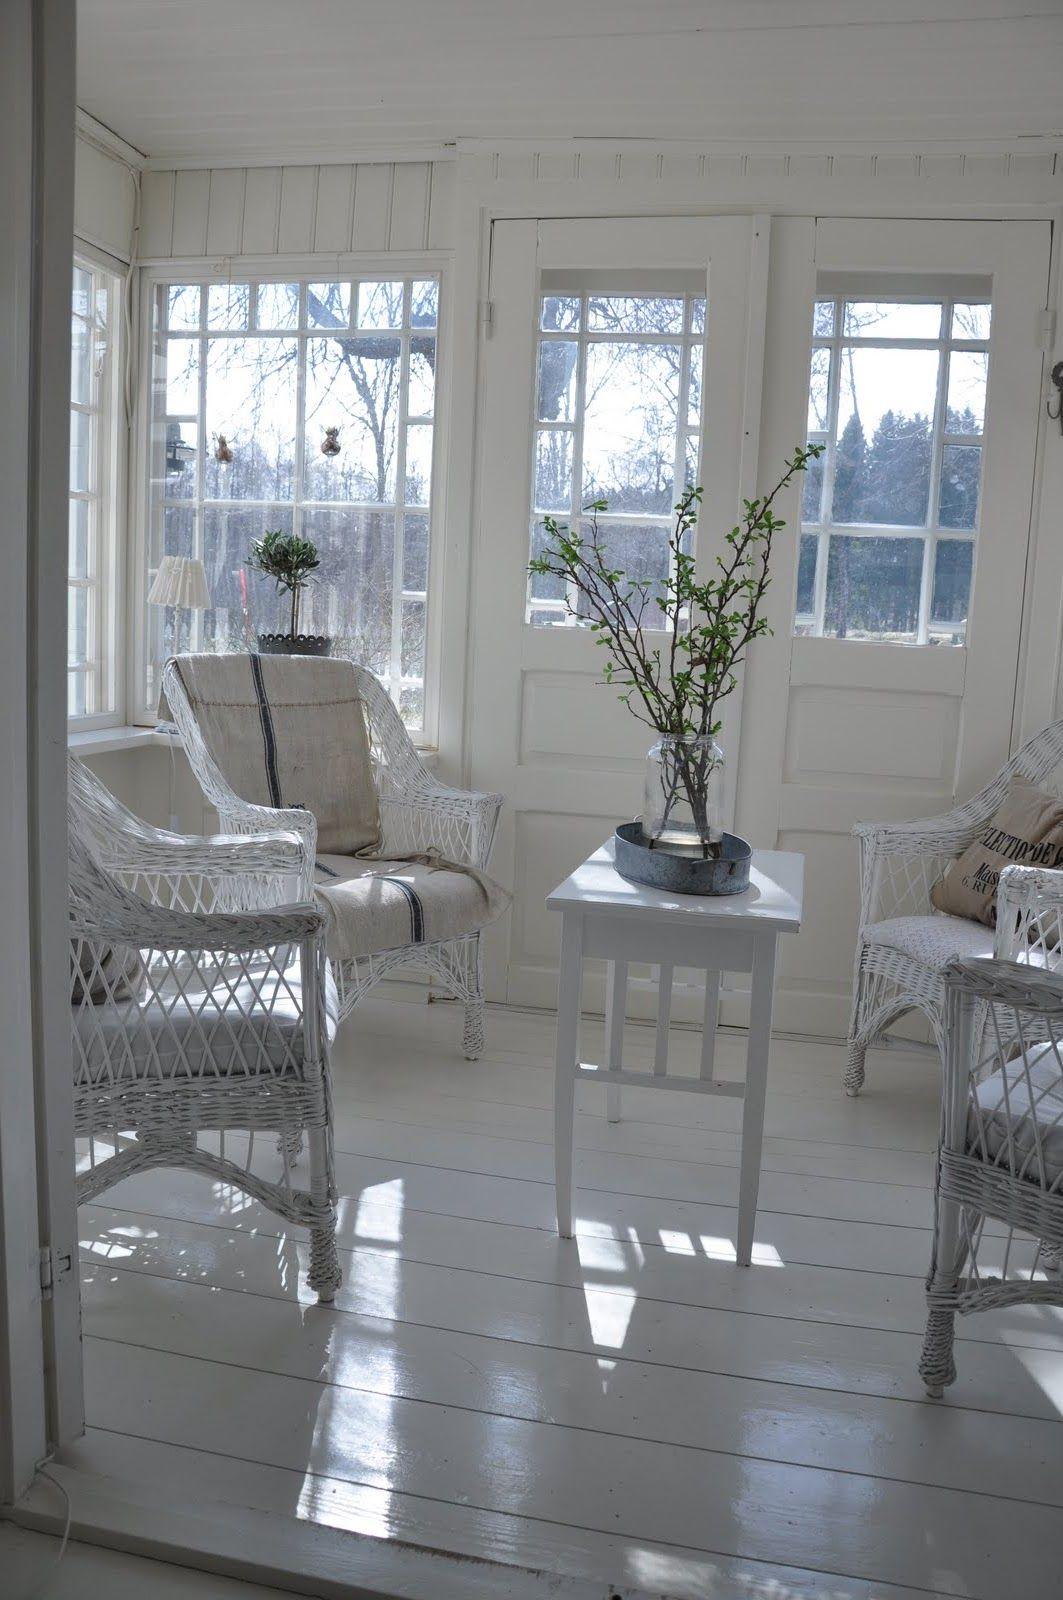 Window ideas for a sunroom  high gloss whitepainted floors  loving this  pinterest  sunroom